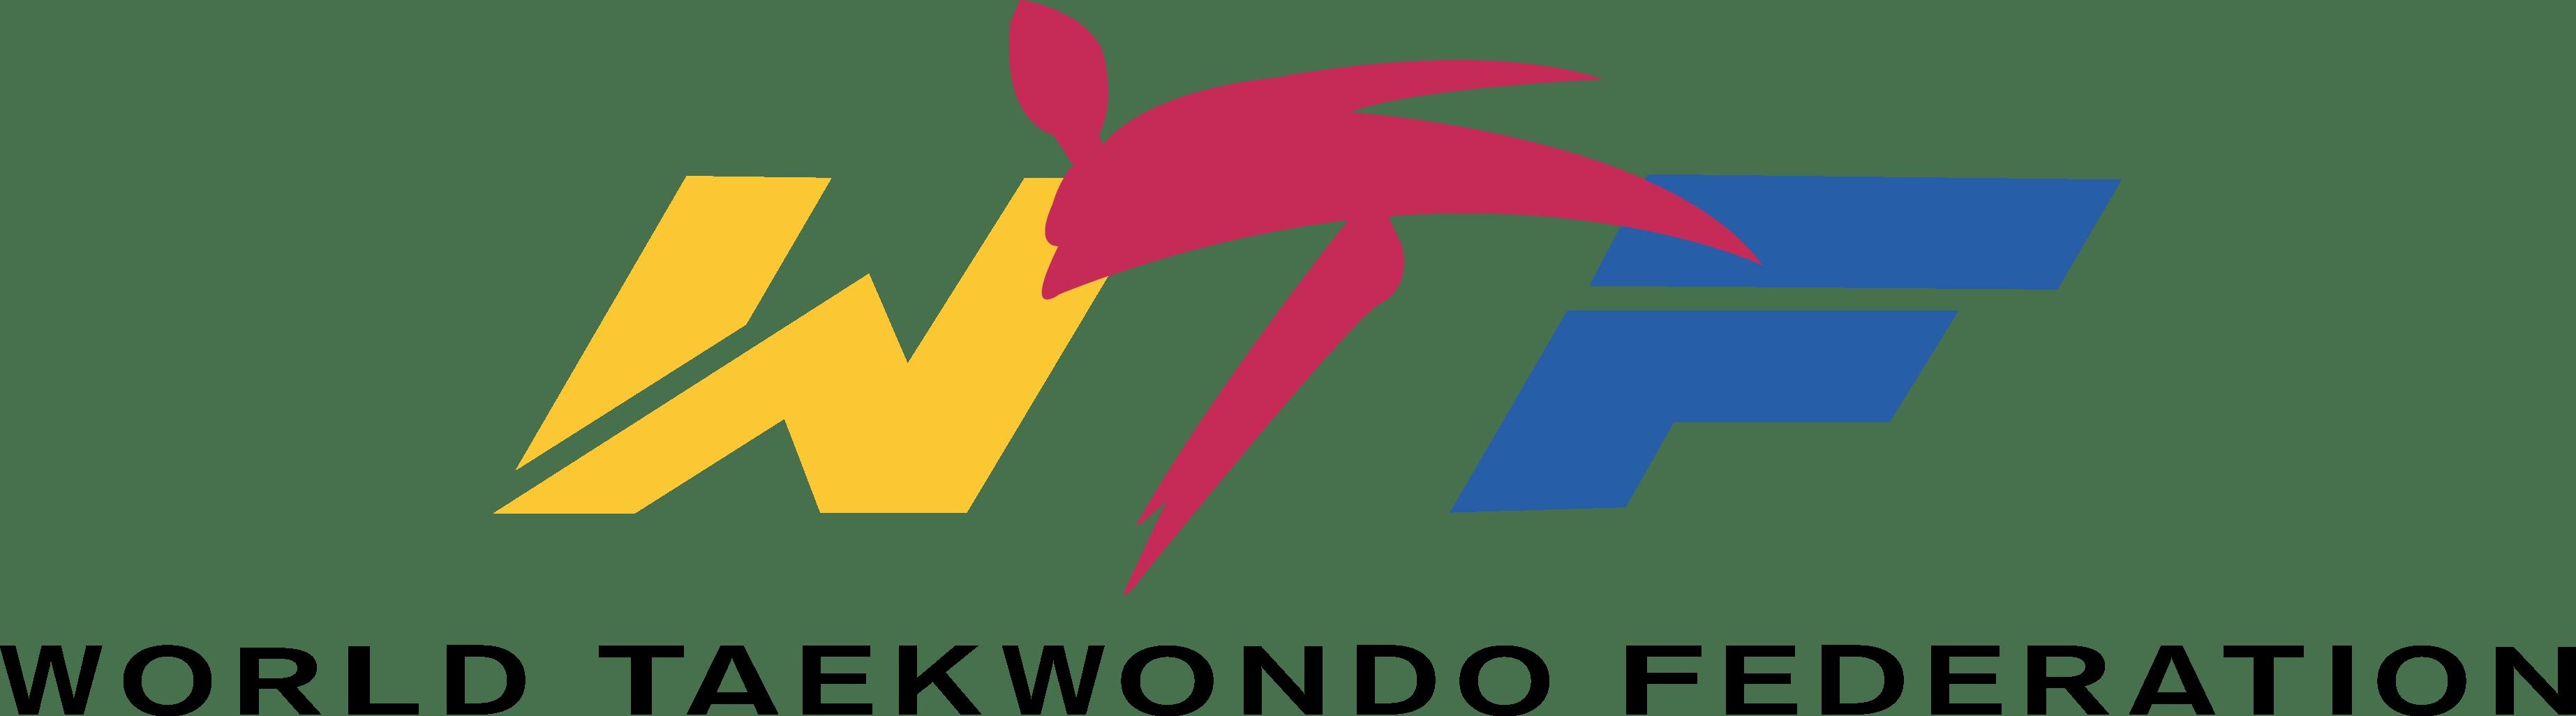 Transparent tkd clipart - World Taekwondo Federation Logo [wtf - Wtf Taekwondo Logo Vector